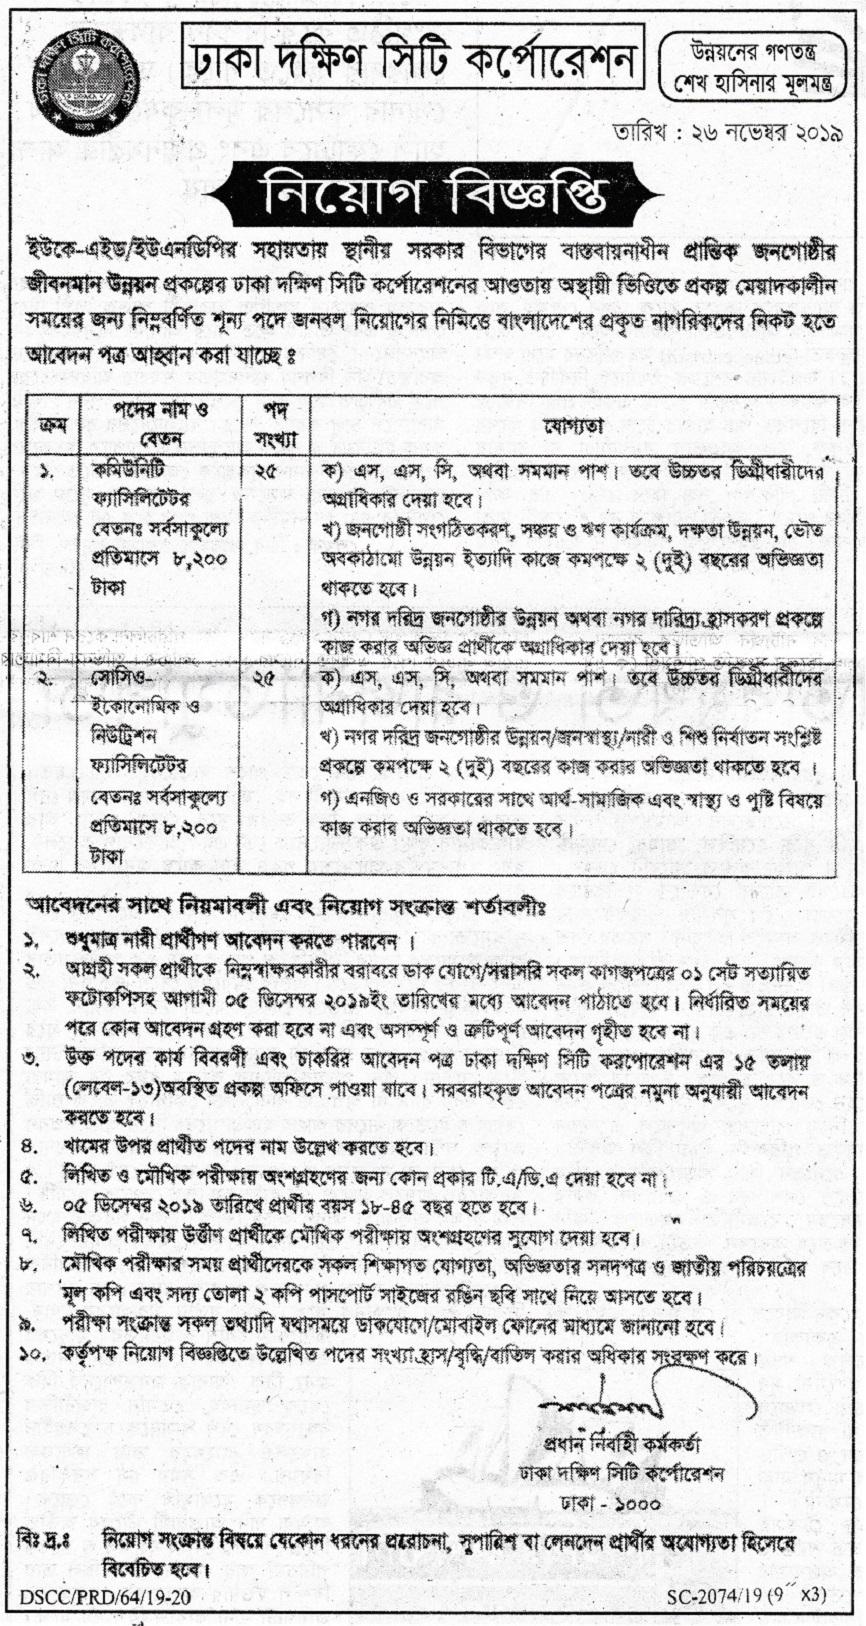 Dhaka South City Corporation Job Circular 2019